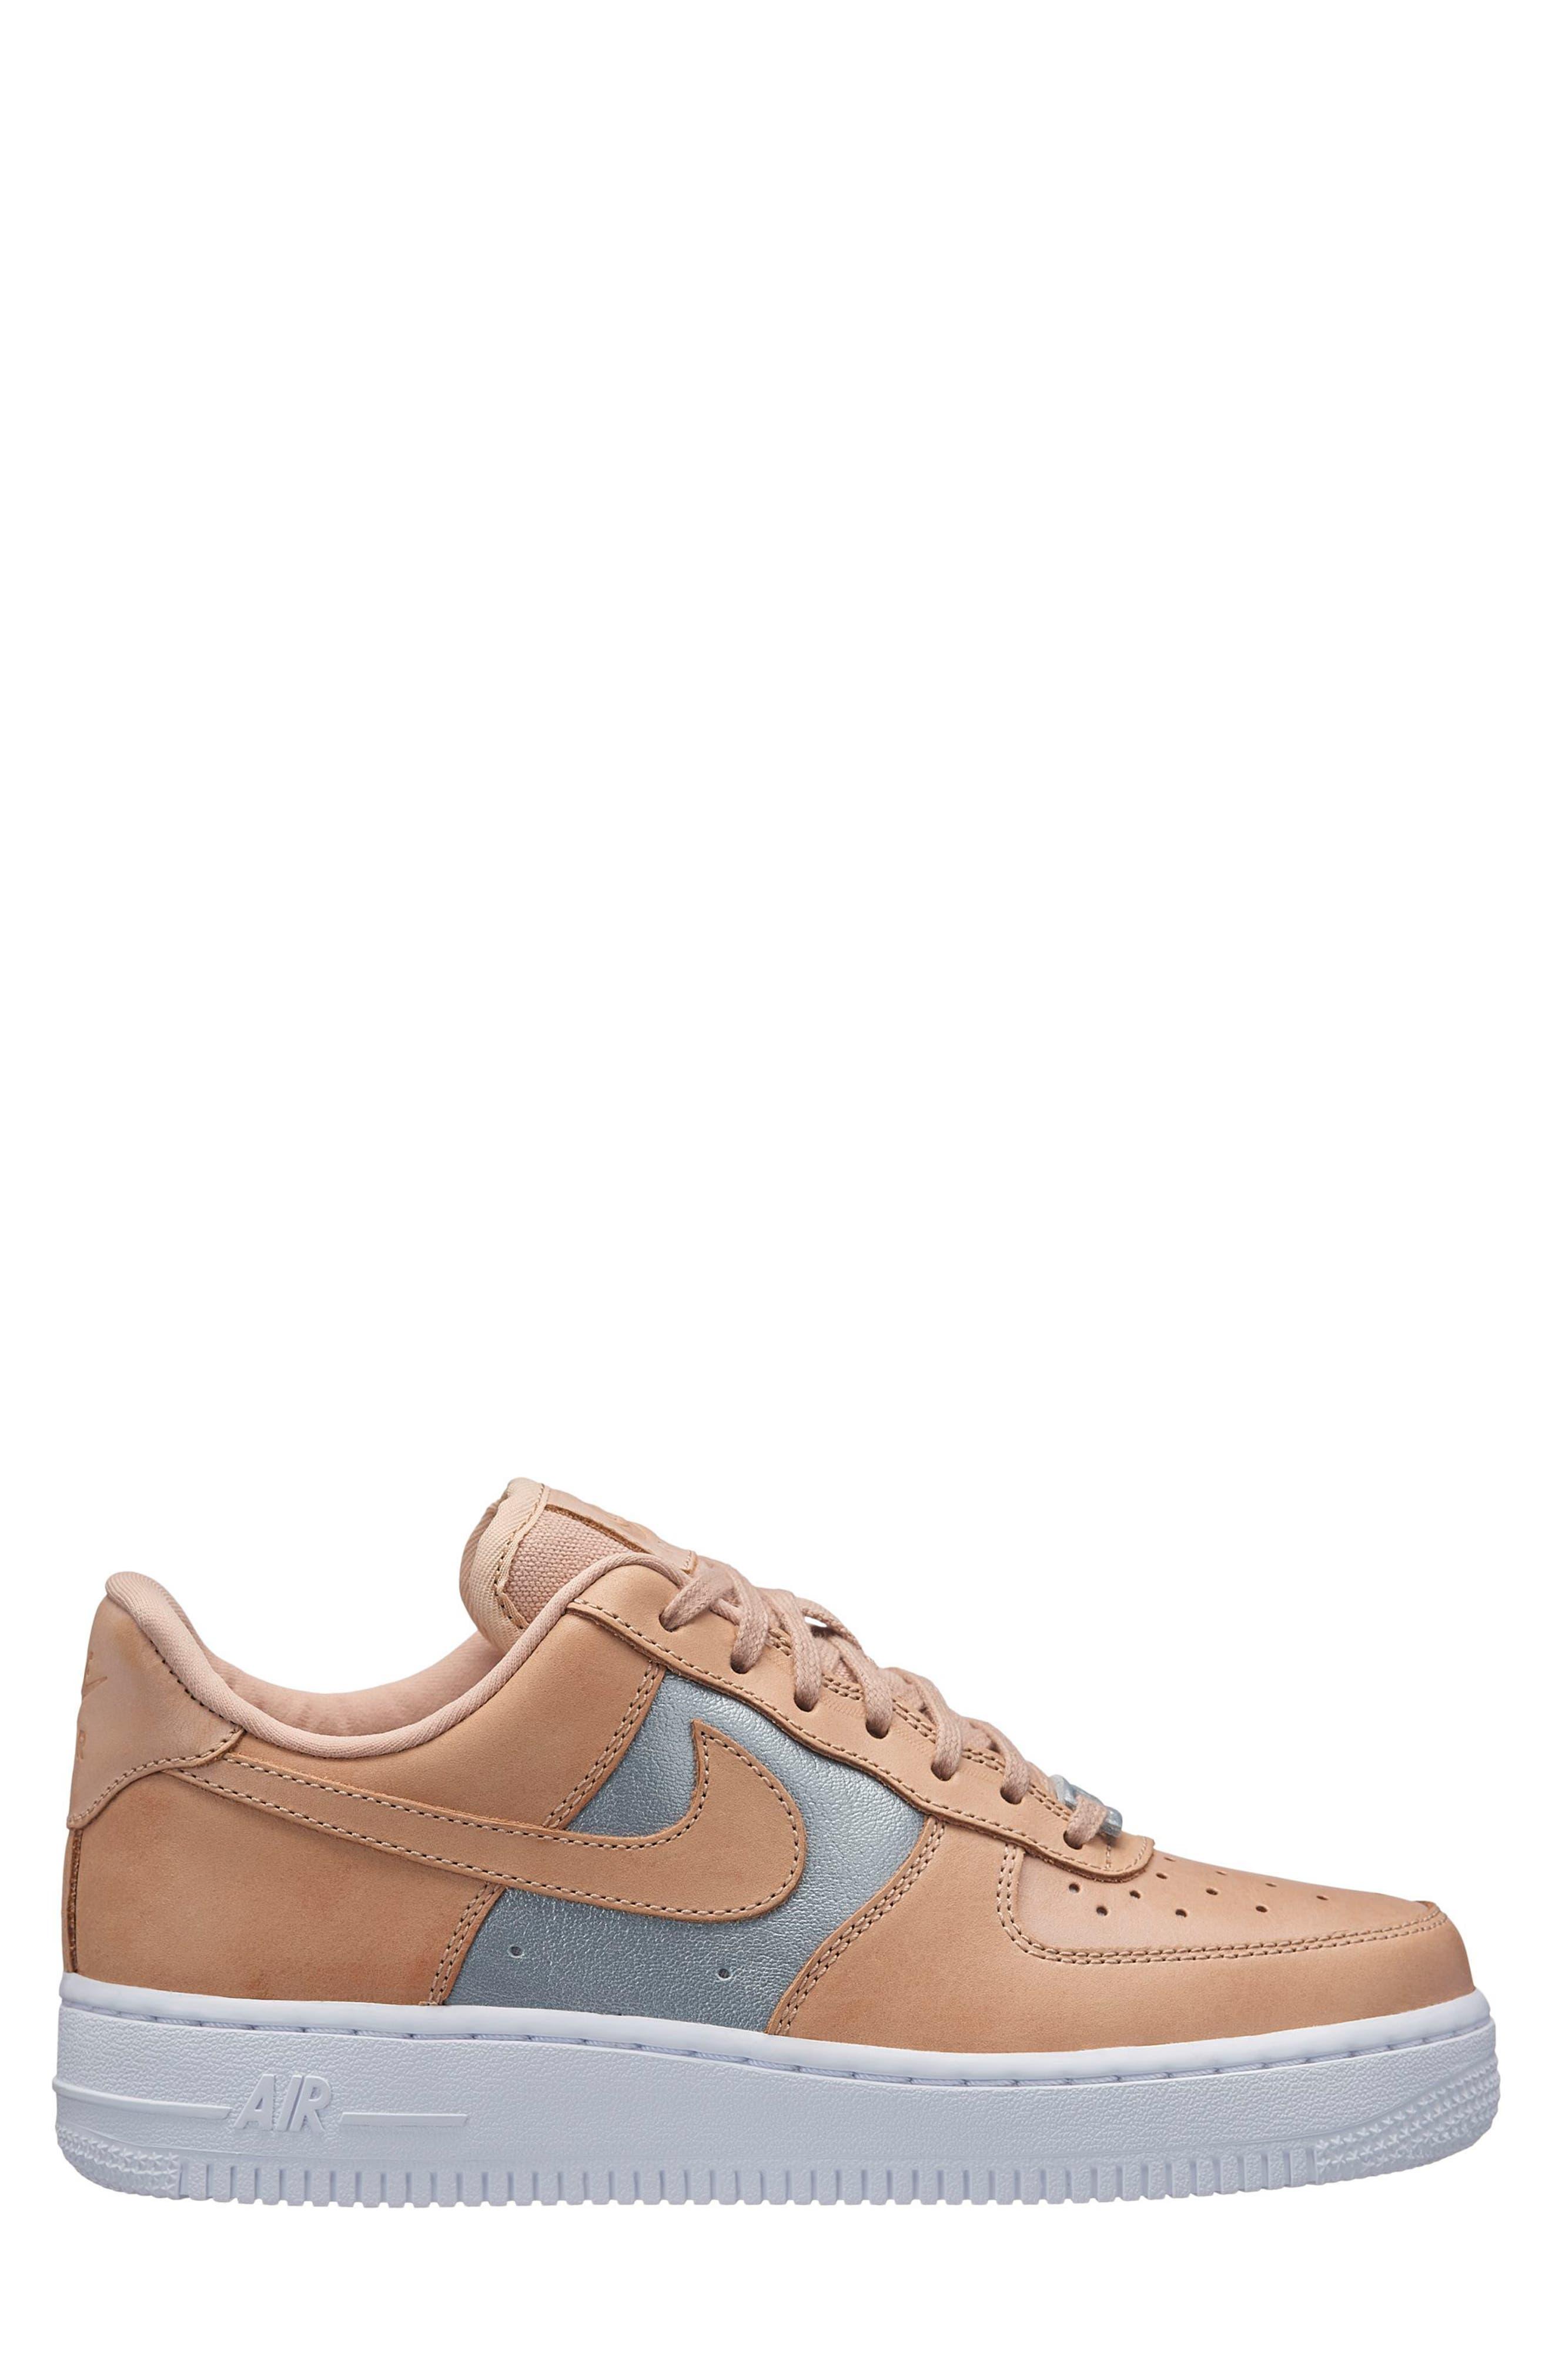 Air Force 1 '07 SE Premium Sneaker,                             Alternate thumbnail 3, color,                             Beige/ Silver/ White